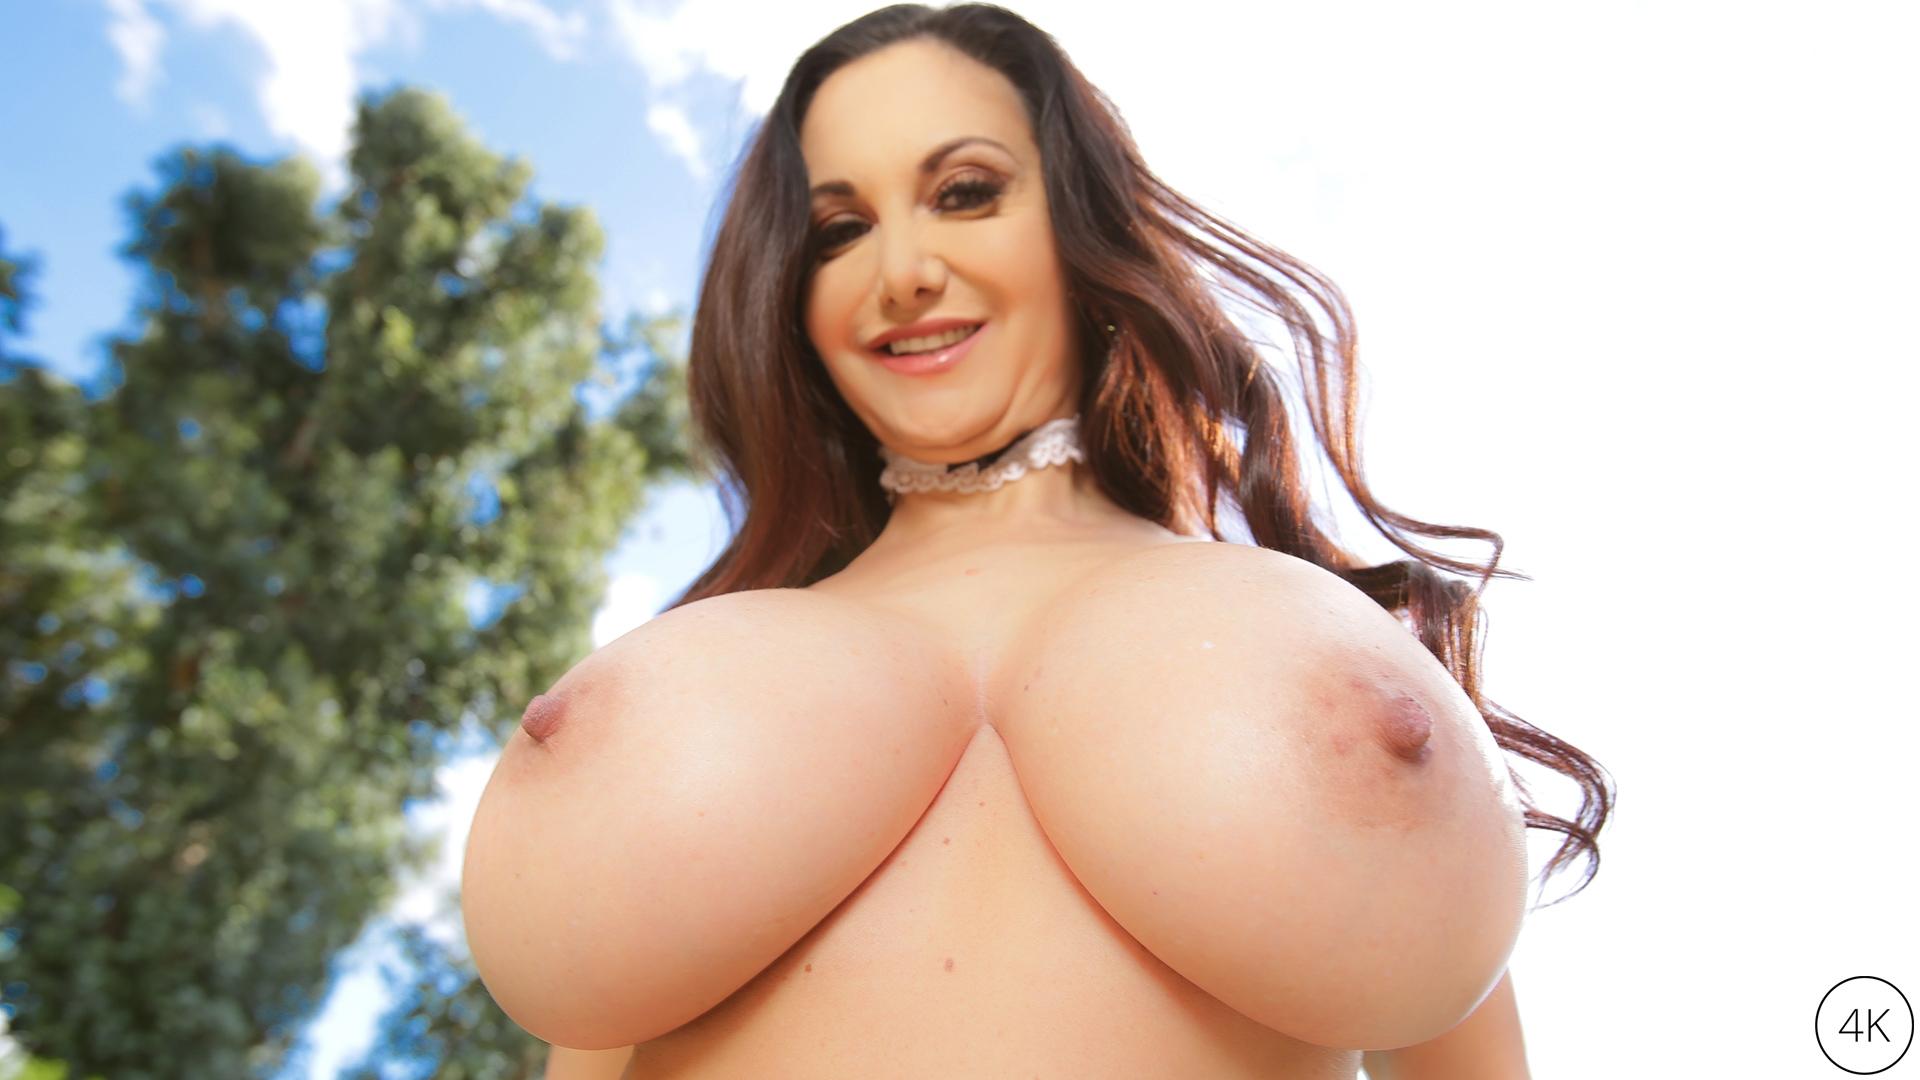 JulesJordan.com - Ava Addams, Ho Ho Ho Santa Brought Me Big Titties For Christmas